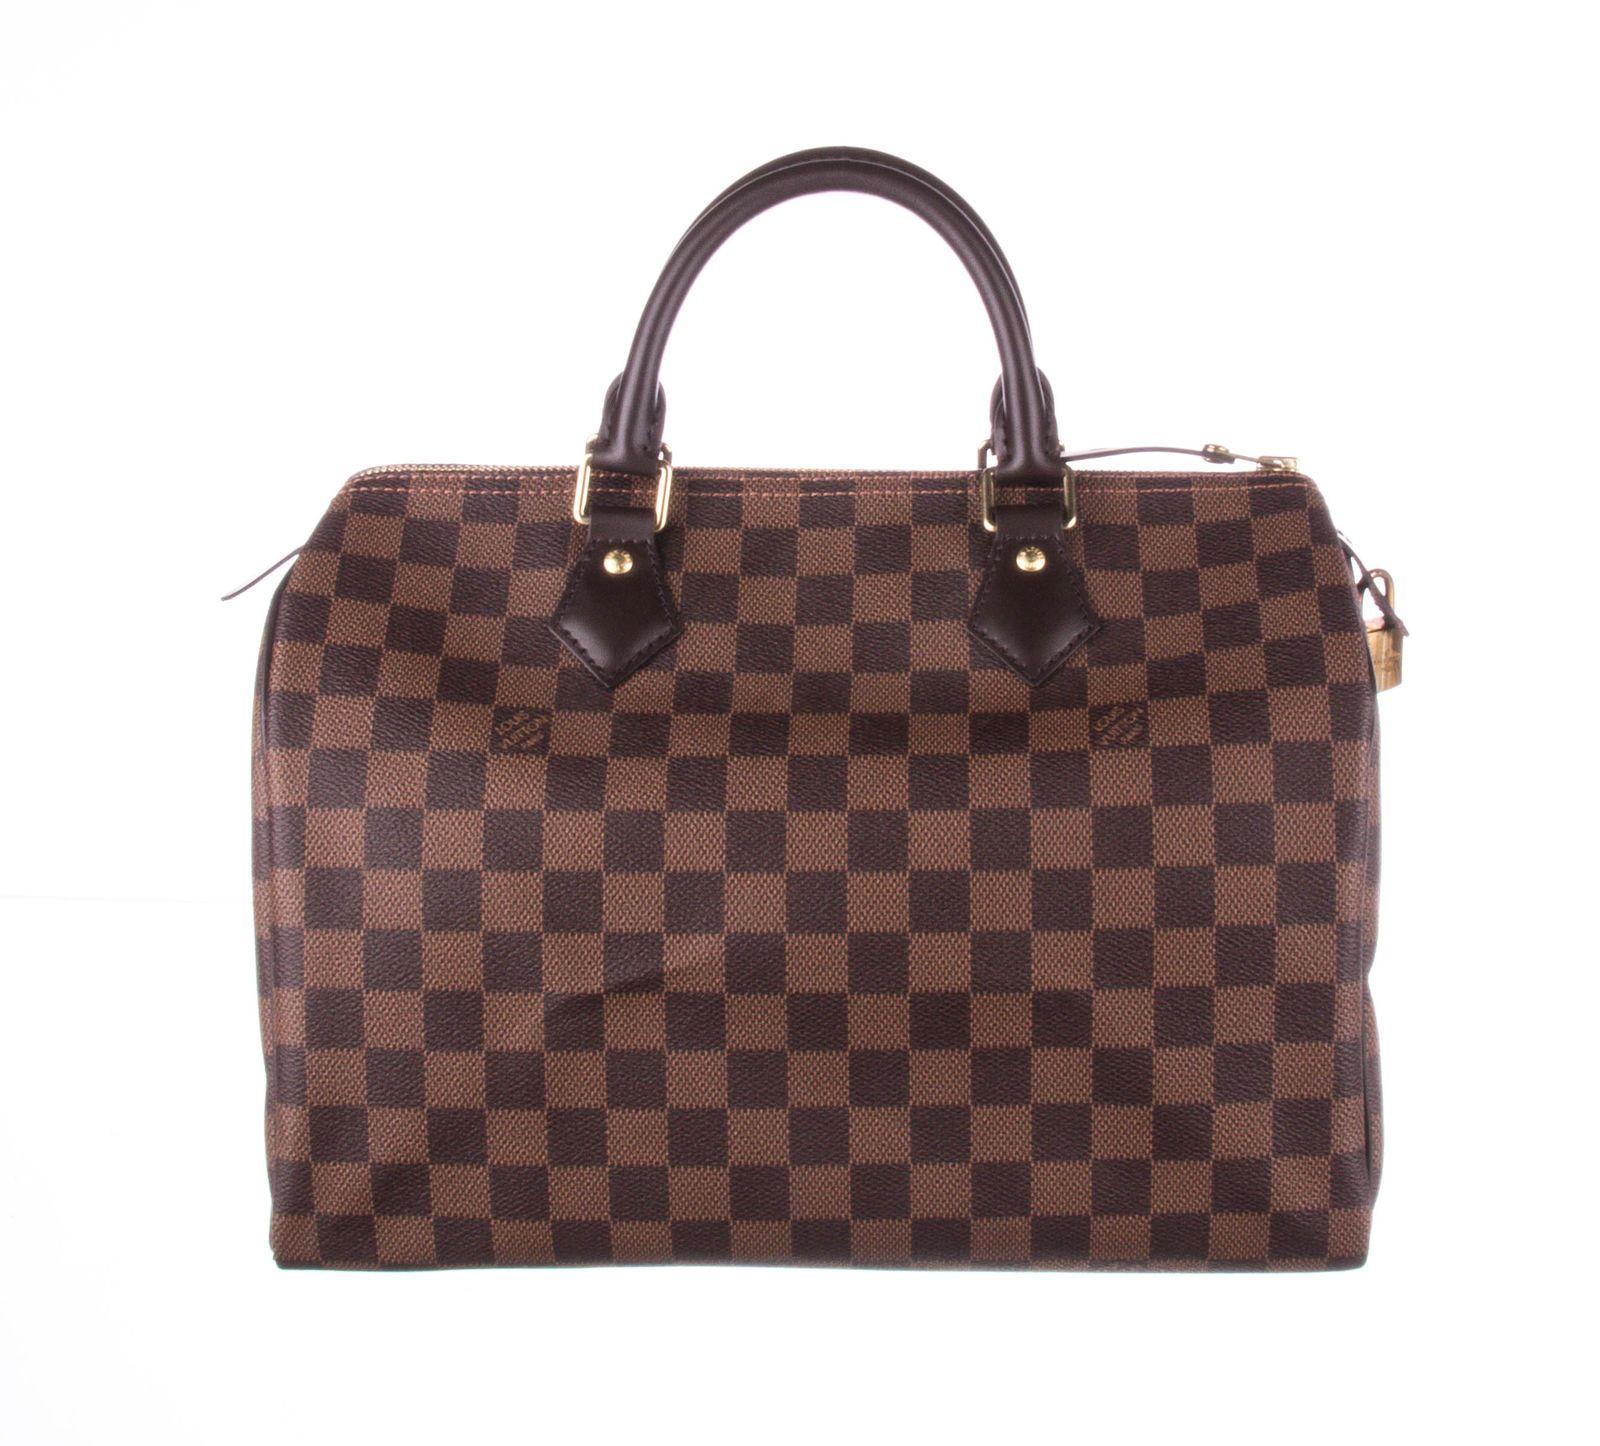 ad0974838f4 Details about LOUIS VUITTON Brown Damier Ebene Canvas Speedy 30 Bag ...